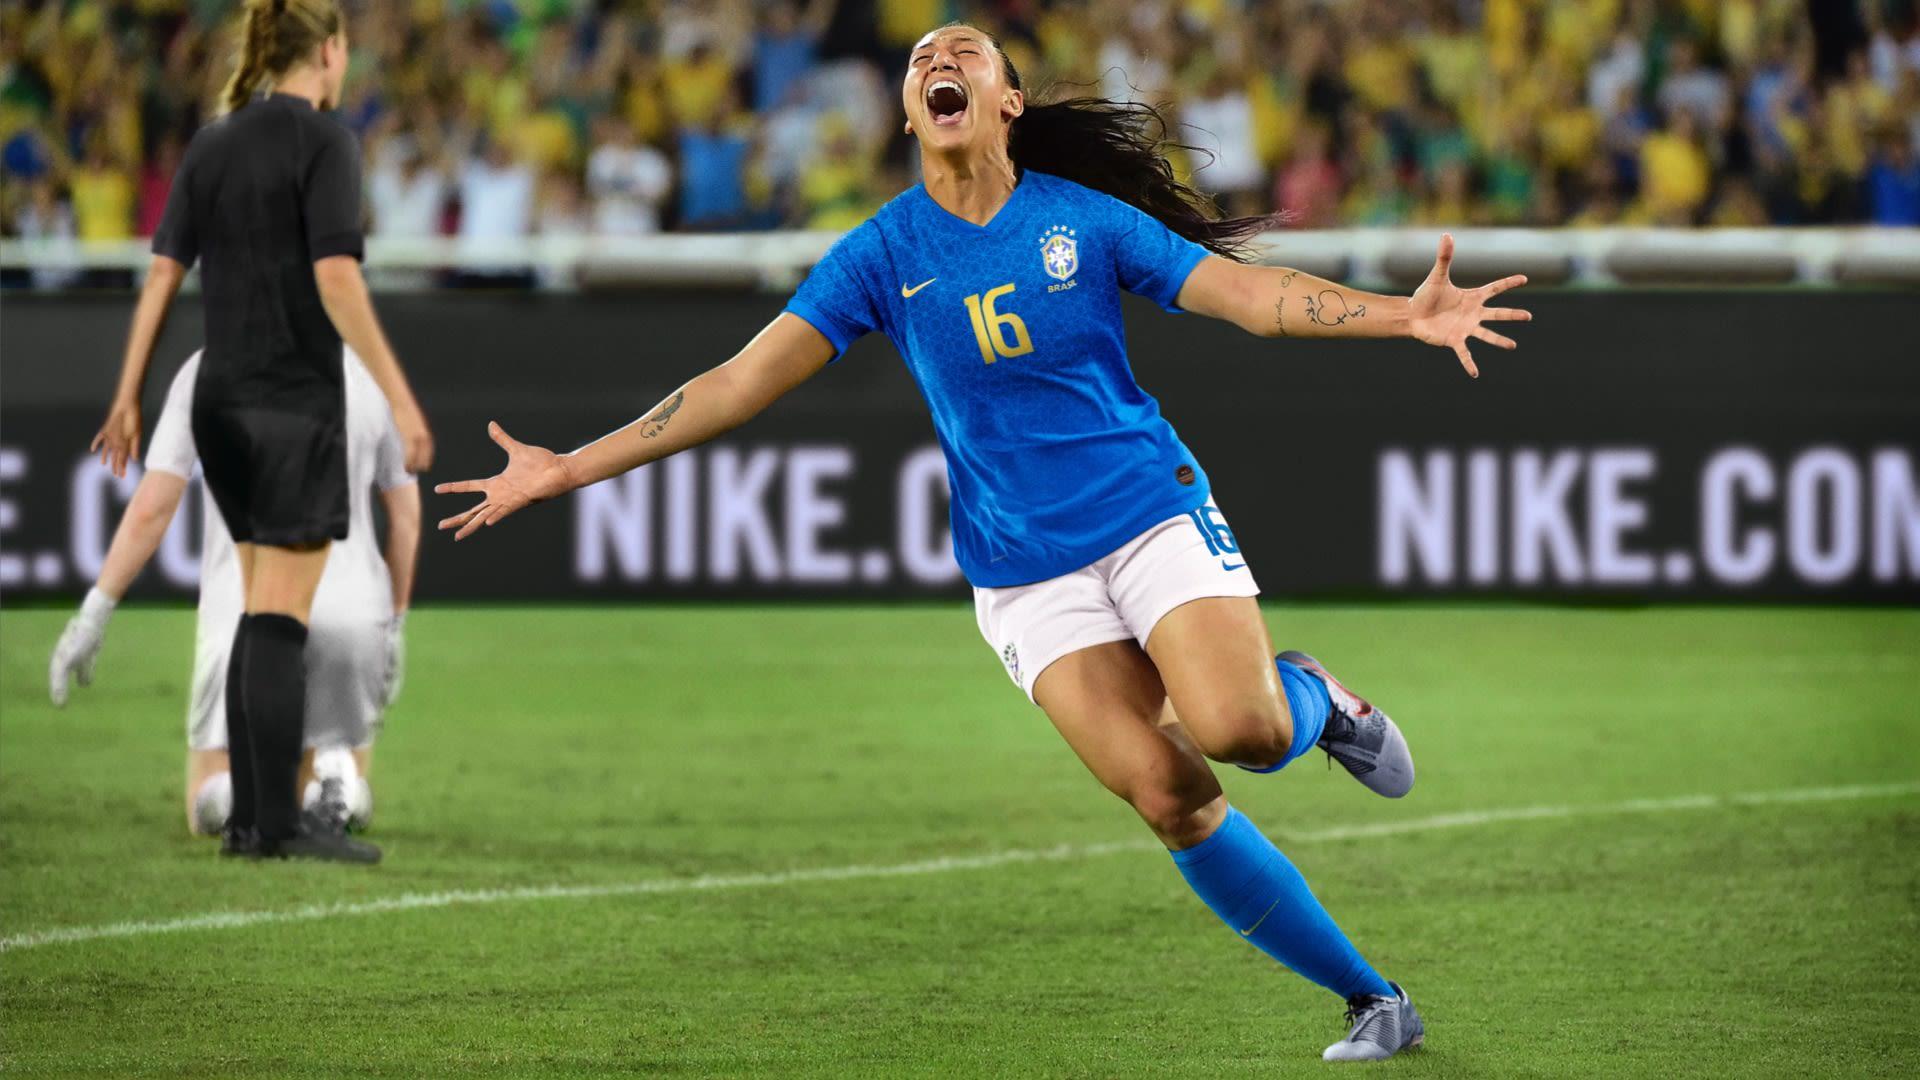 ce37d2886d Maillot 2019 Équipe du Brésil féminine Stadium Away. Nike.com FR